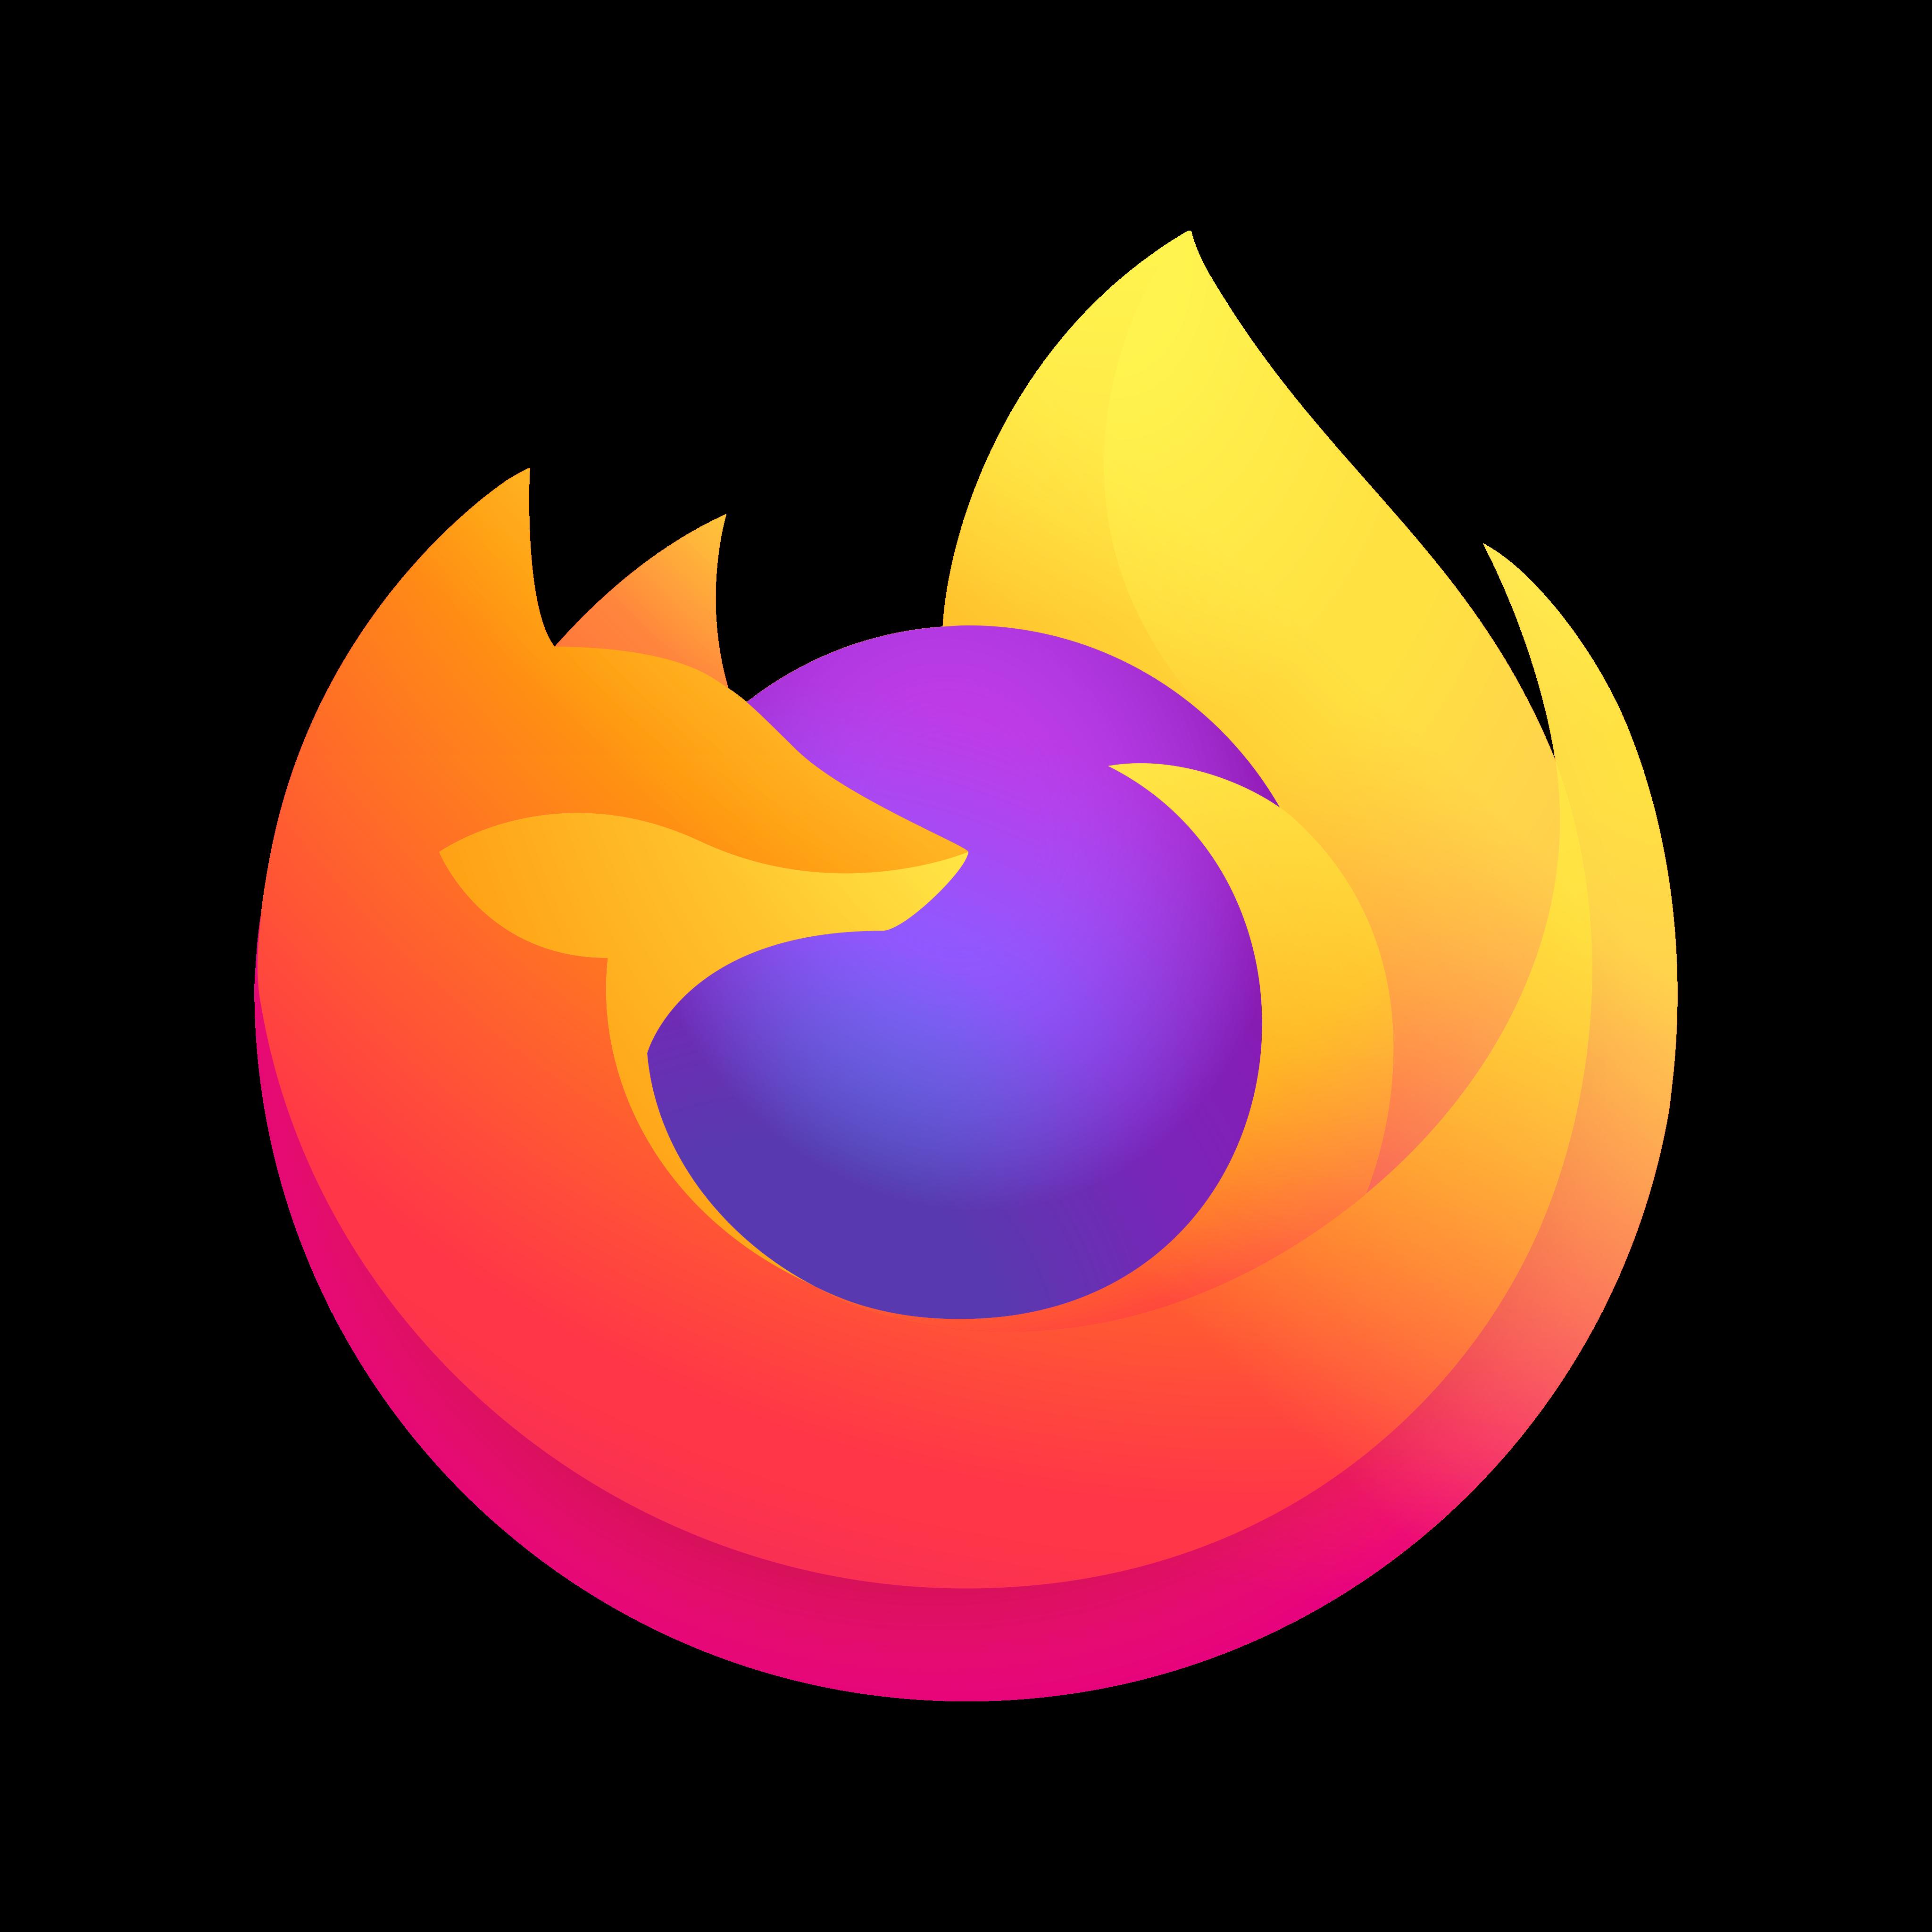 firefox logo 0 - Firefox Logo